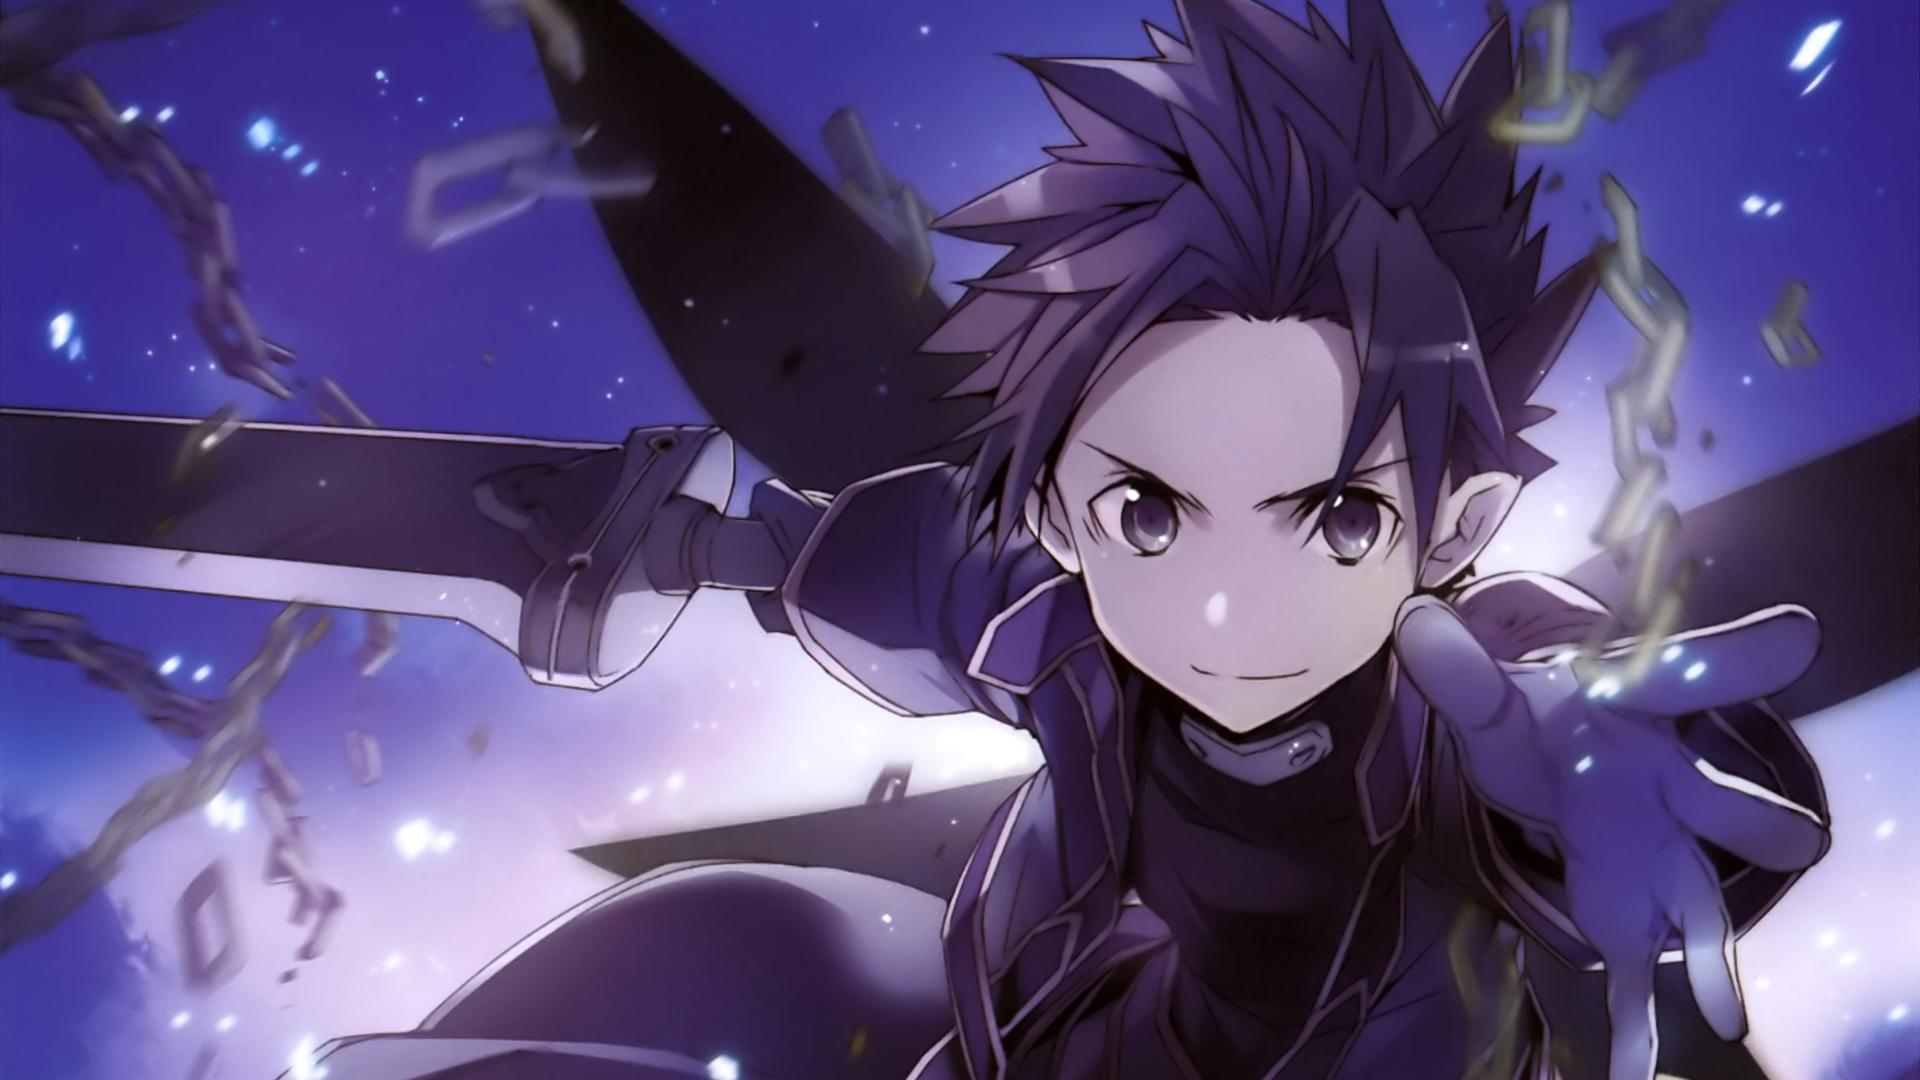 Download 1920x1080 Wallpaper Kirito Sword Art Online Anime Sao